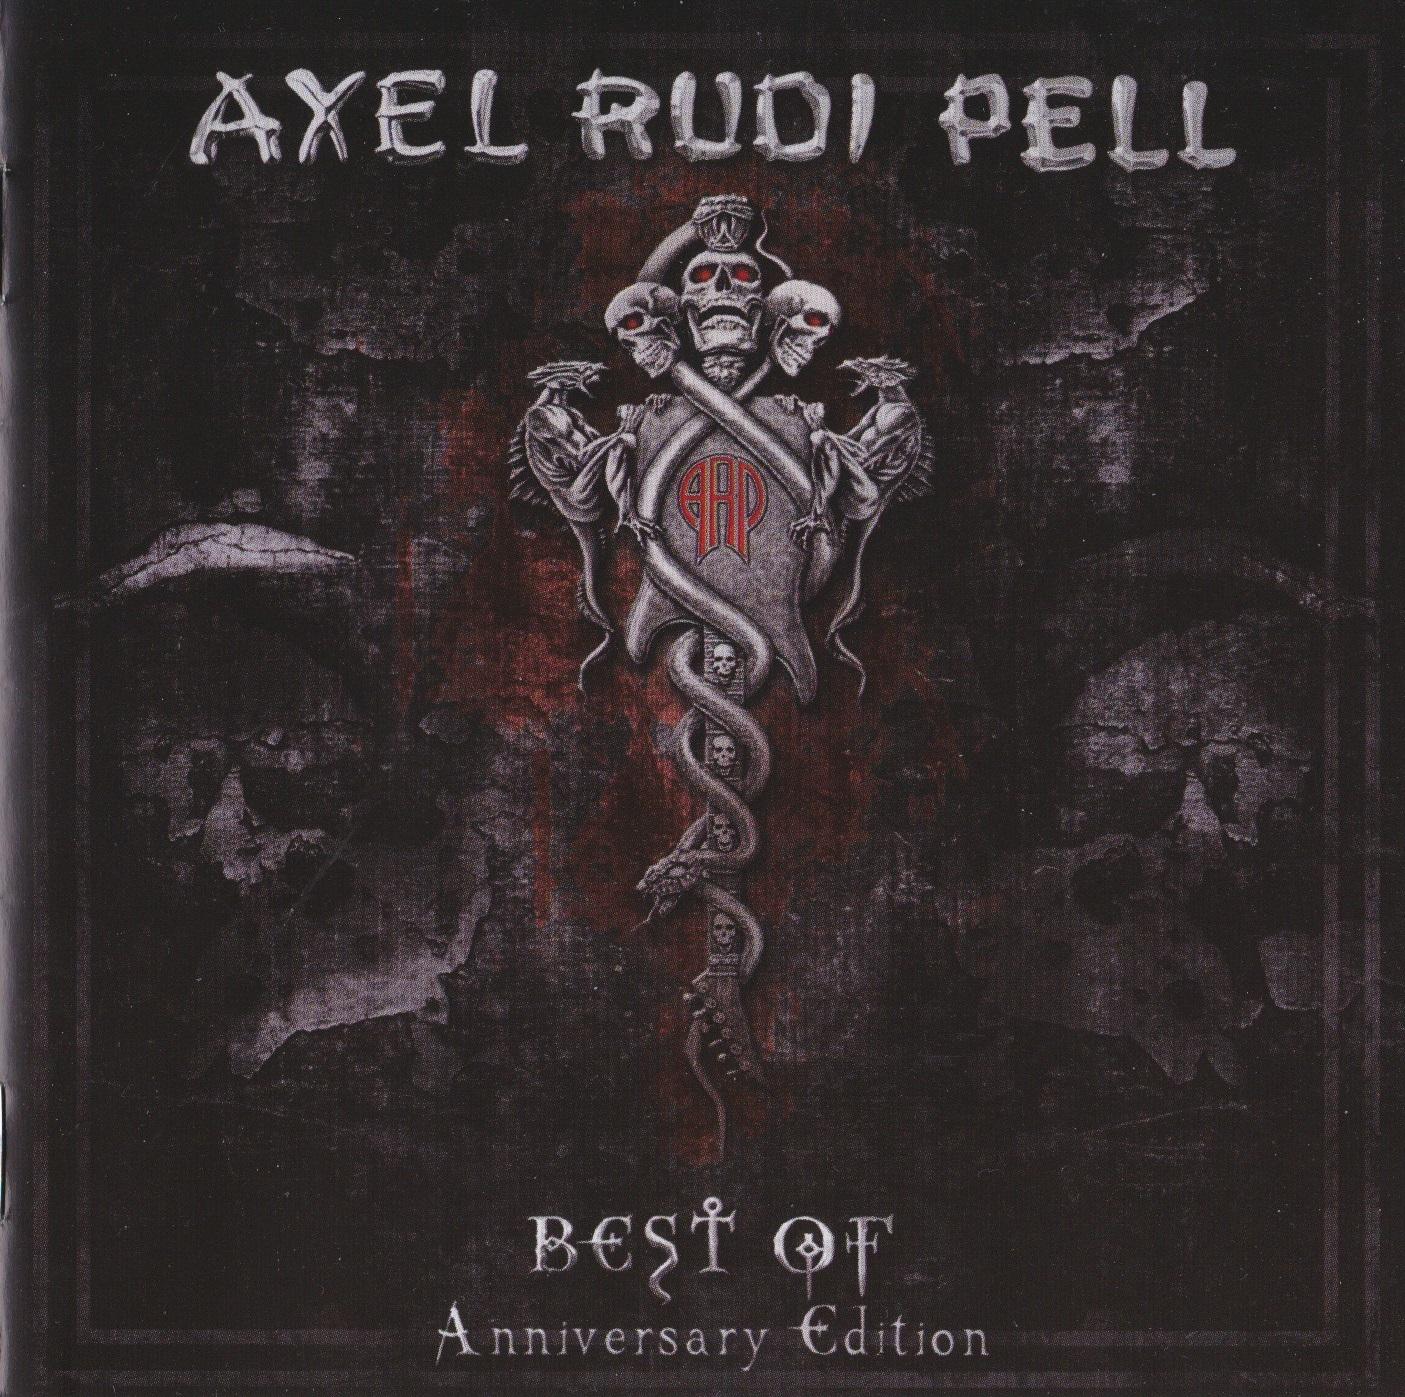 Axel Rudi Pell — Best Of: Anniversary Edition (2009)